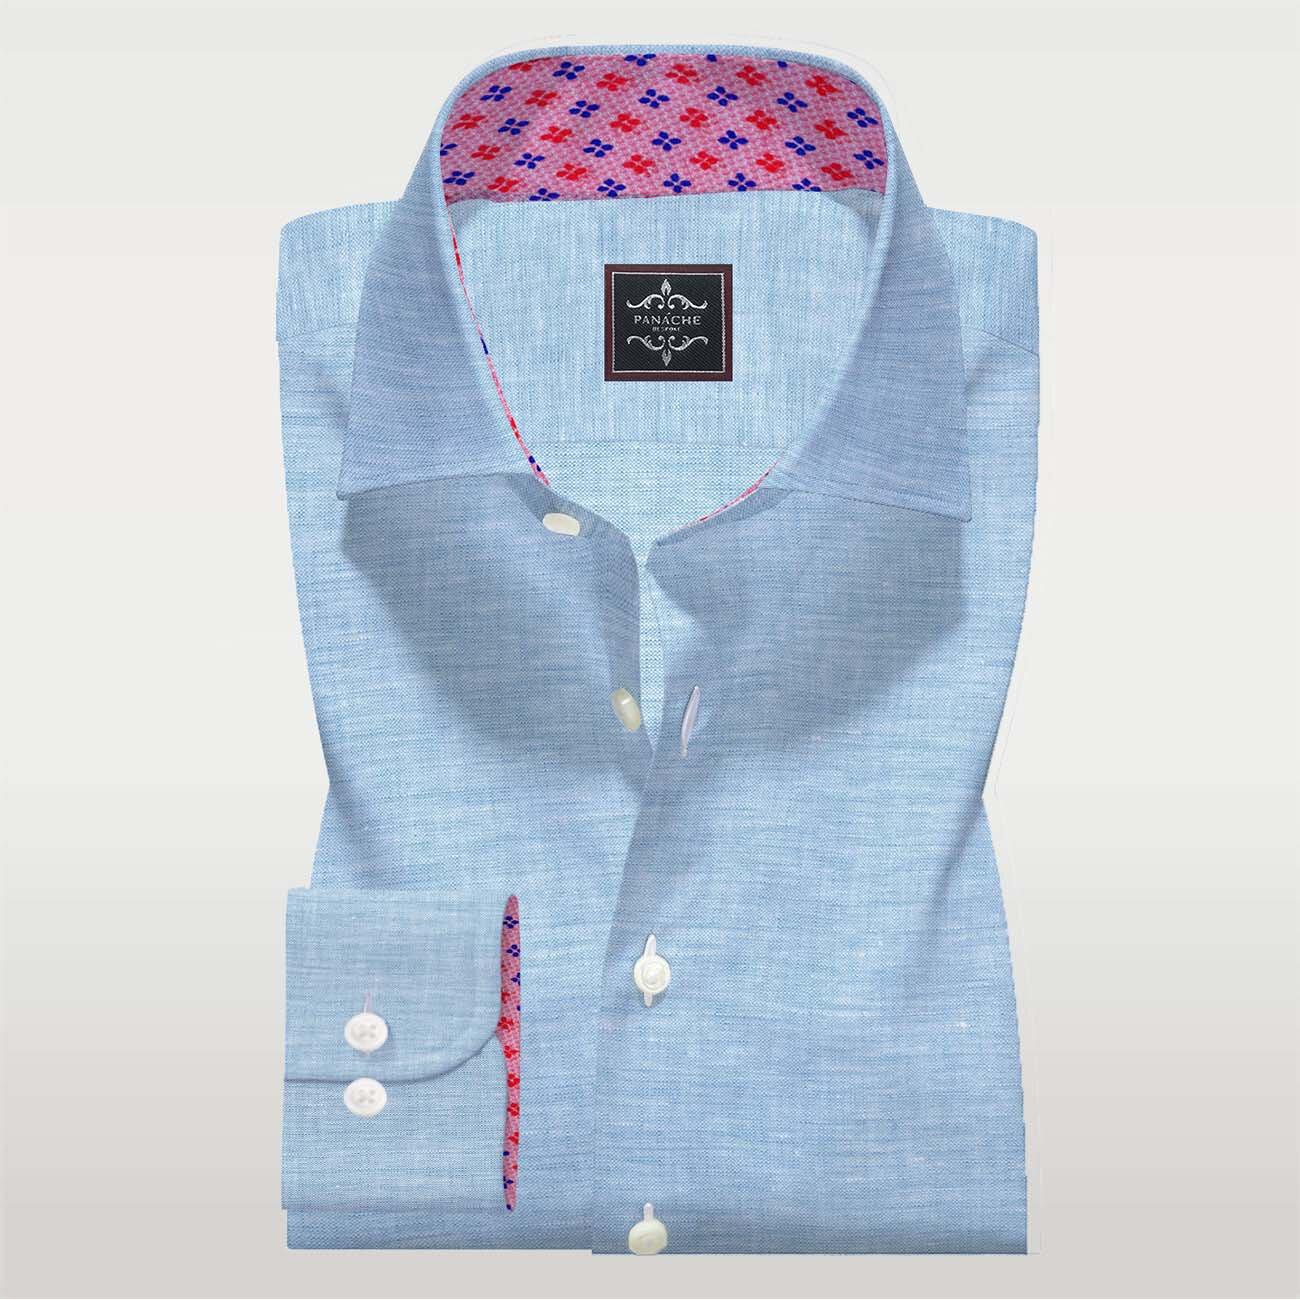 Best Mens Dress Shirts Turquoise Linen Shirts